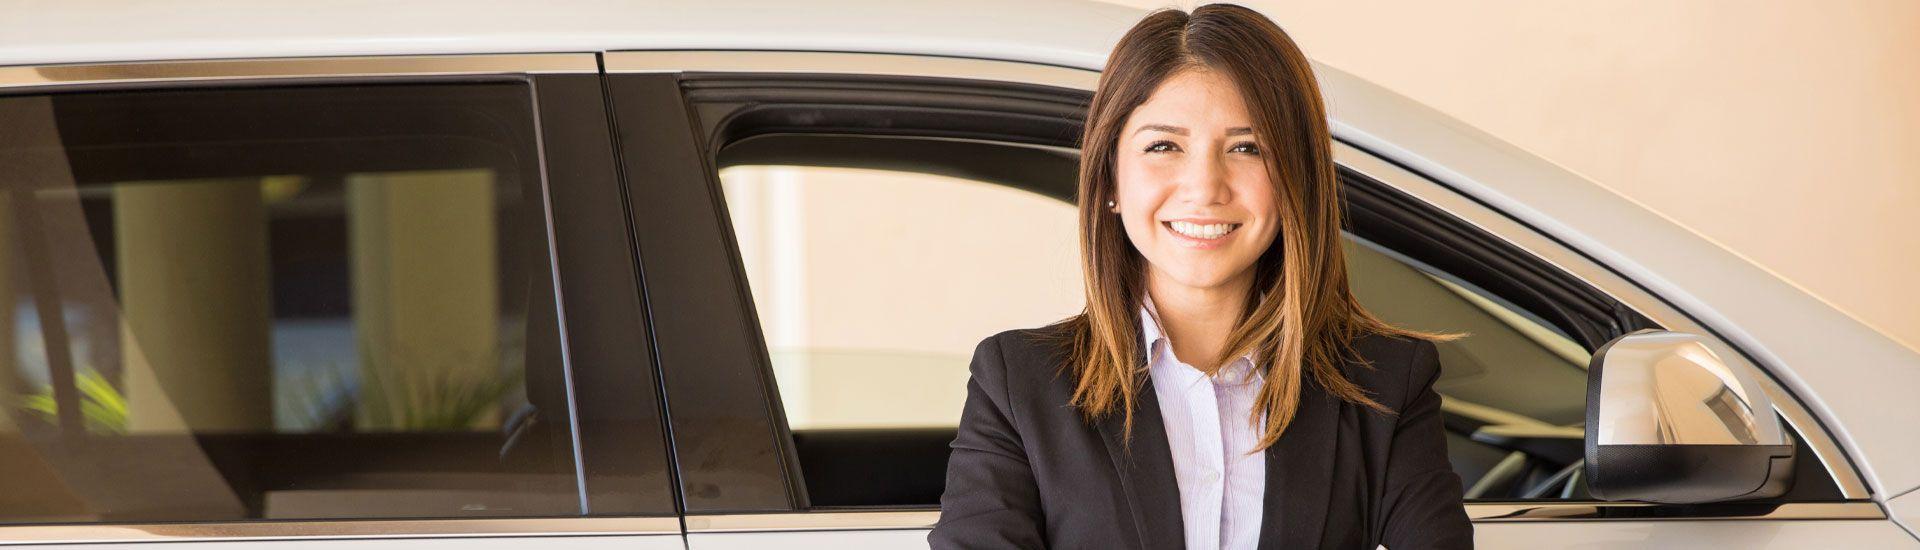 Auto Insurance in East Meadow, Huntington, Mineola, Plainview, Rockville Centre, and Williston Park, NY